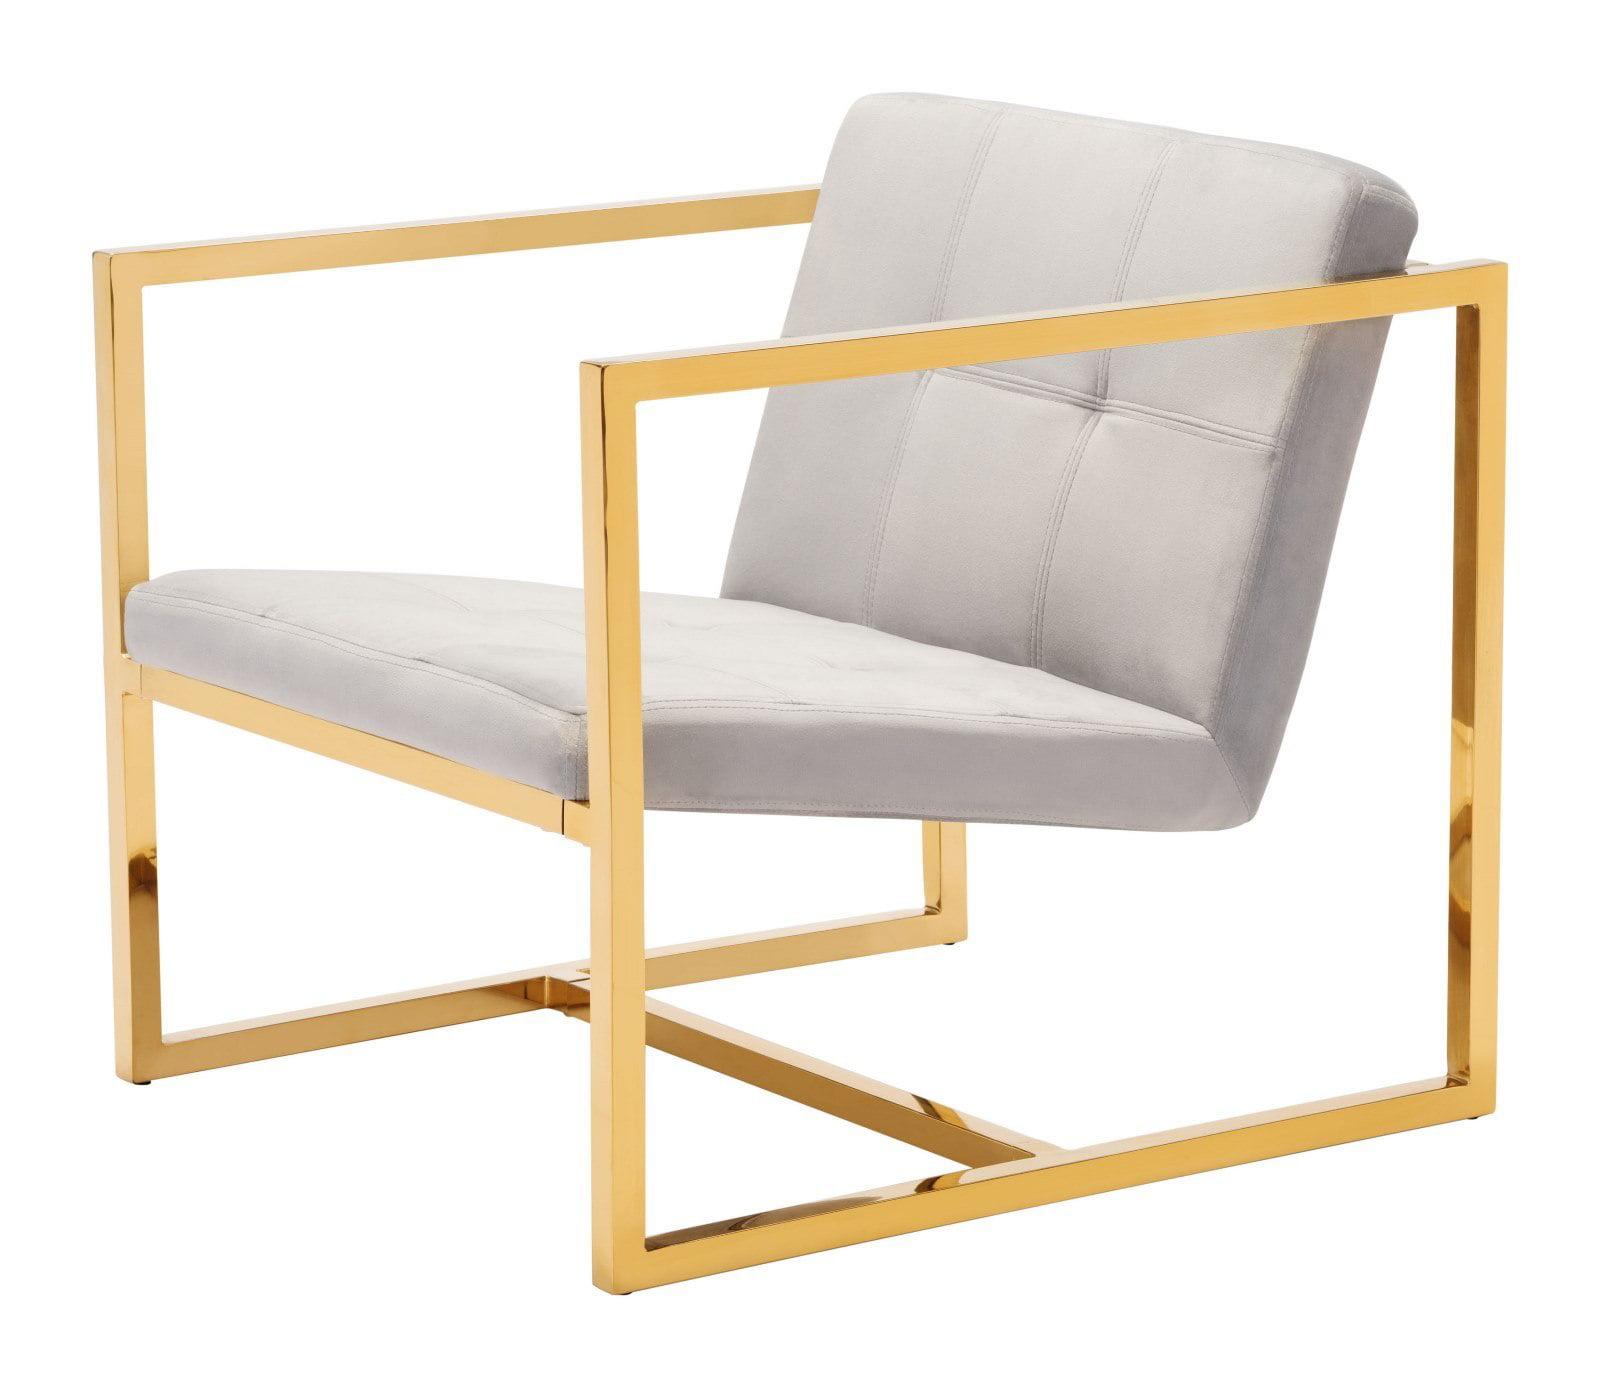 Modern contemporary armchair accent chair grey gray velvet fabric chromed steel walmart com